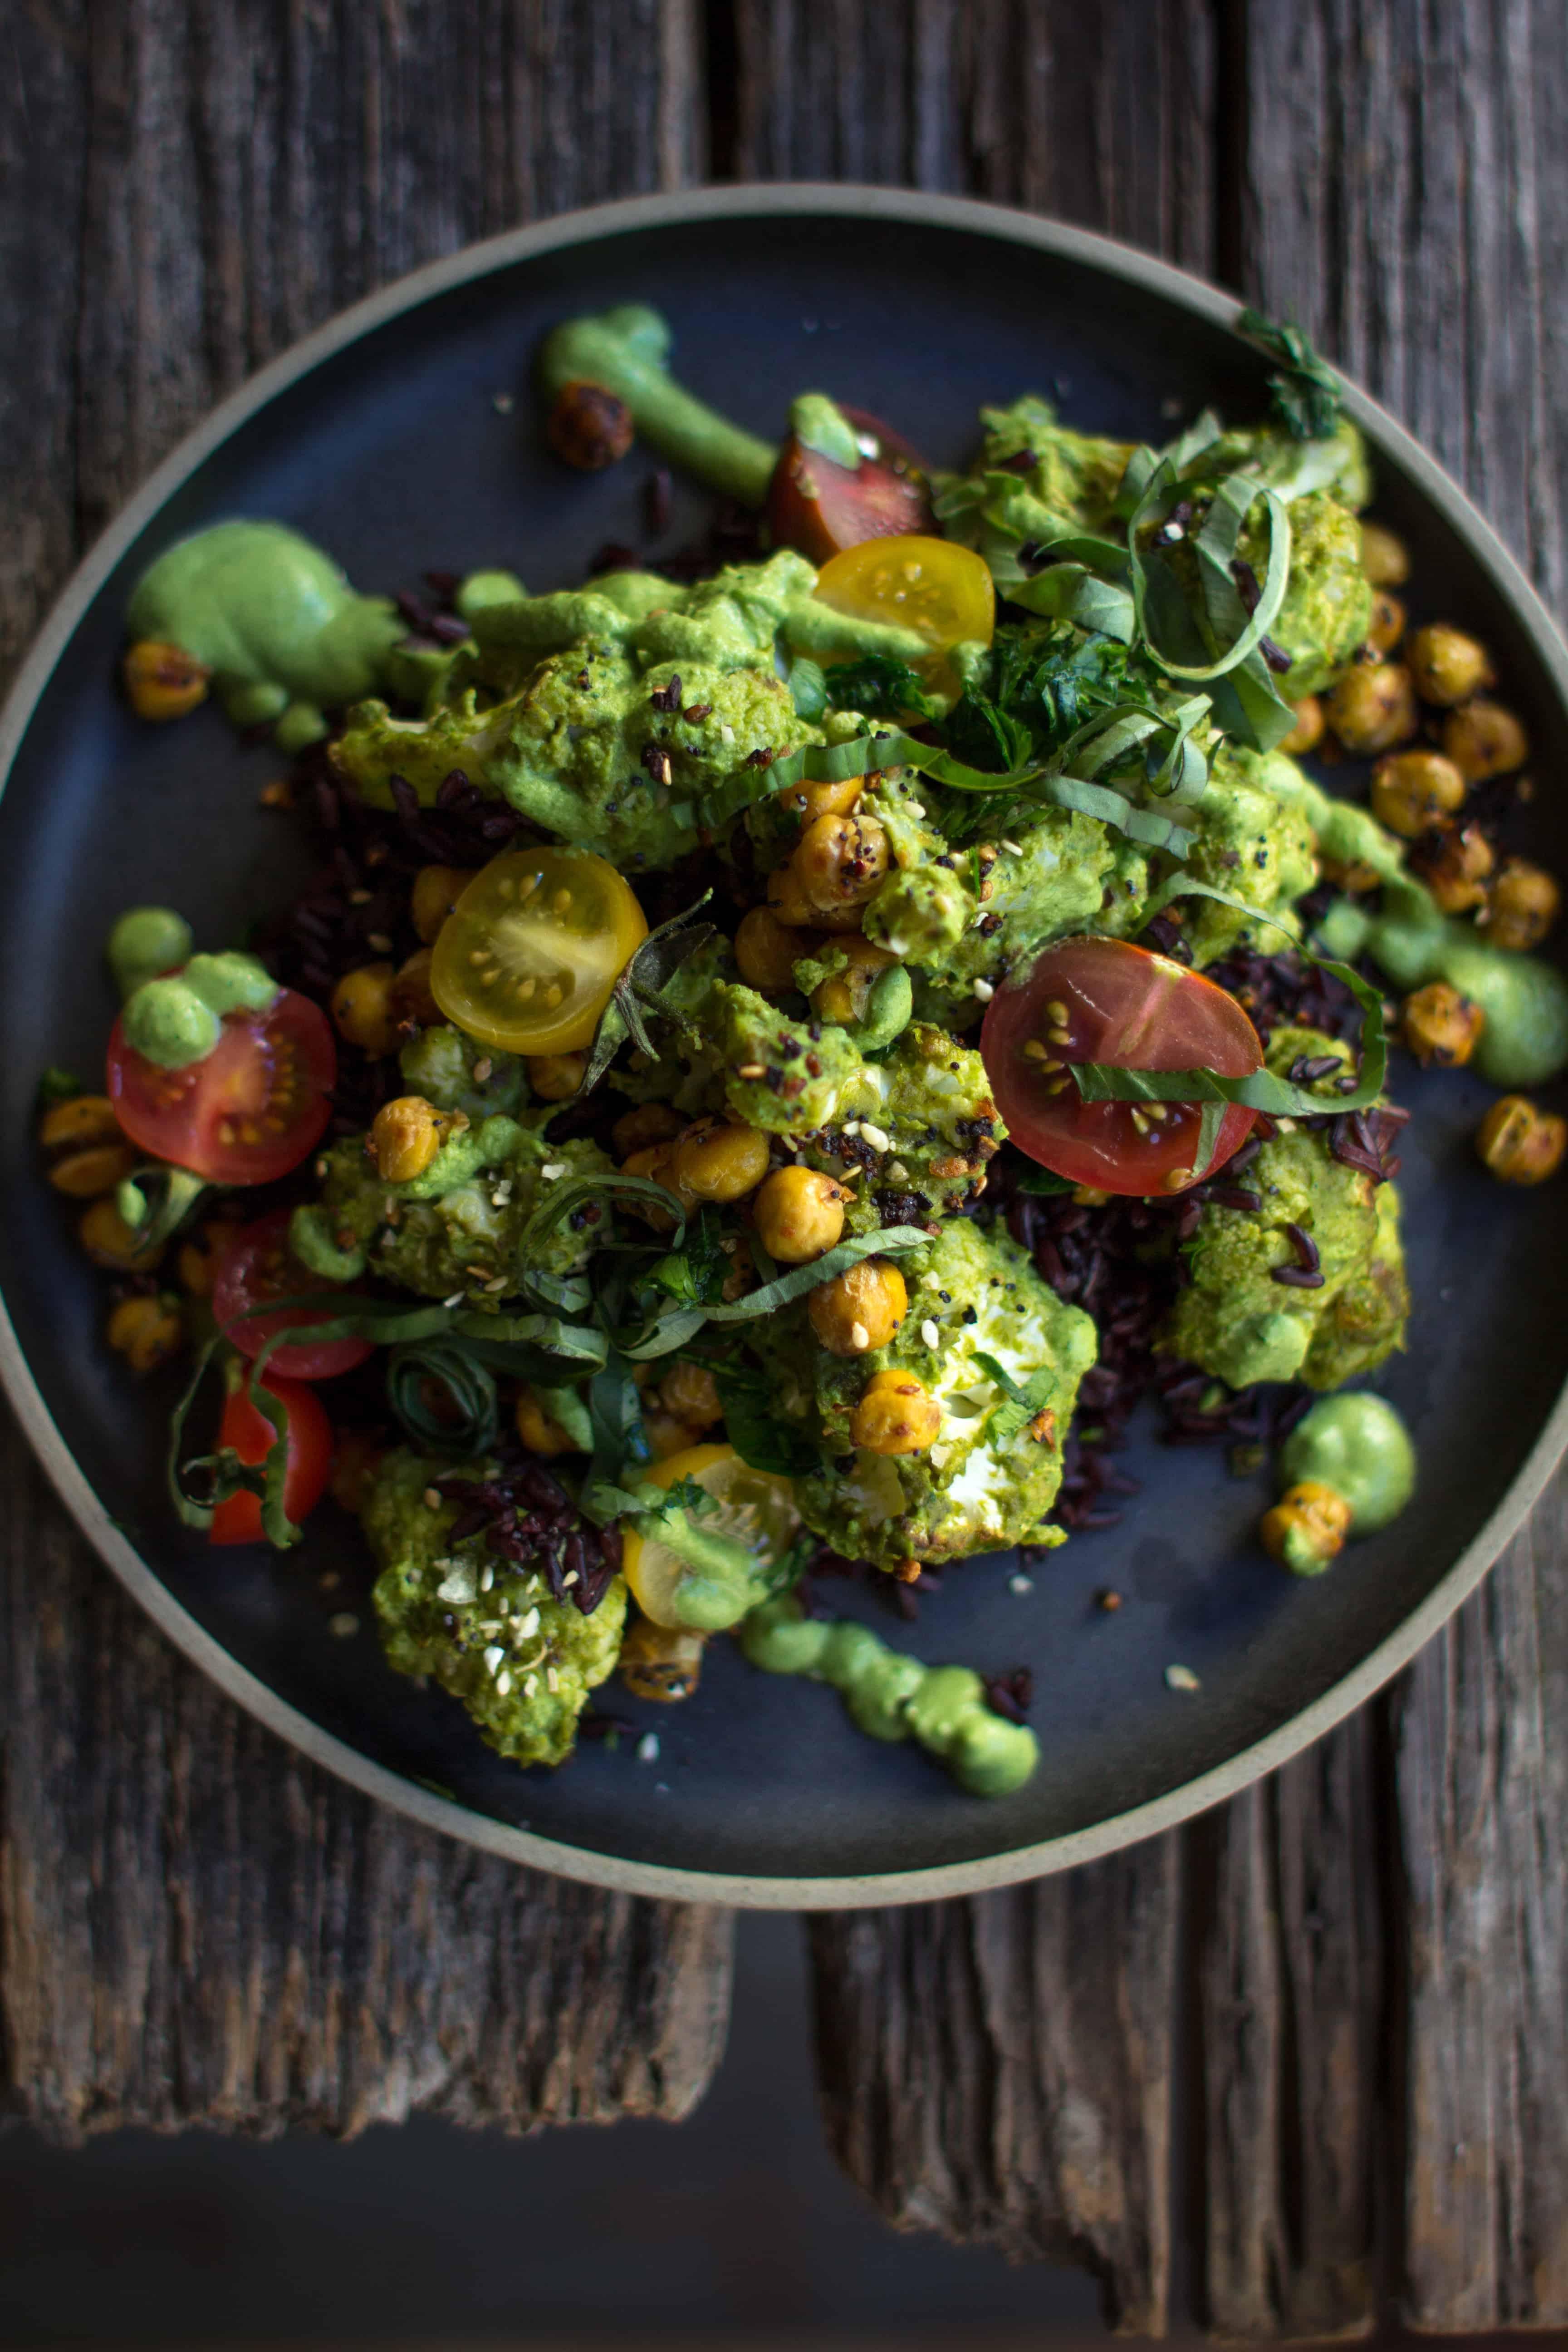 Best Ever Cauliflower Roast recipe by @beardandbonnet on www.thismessisours.com